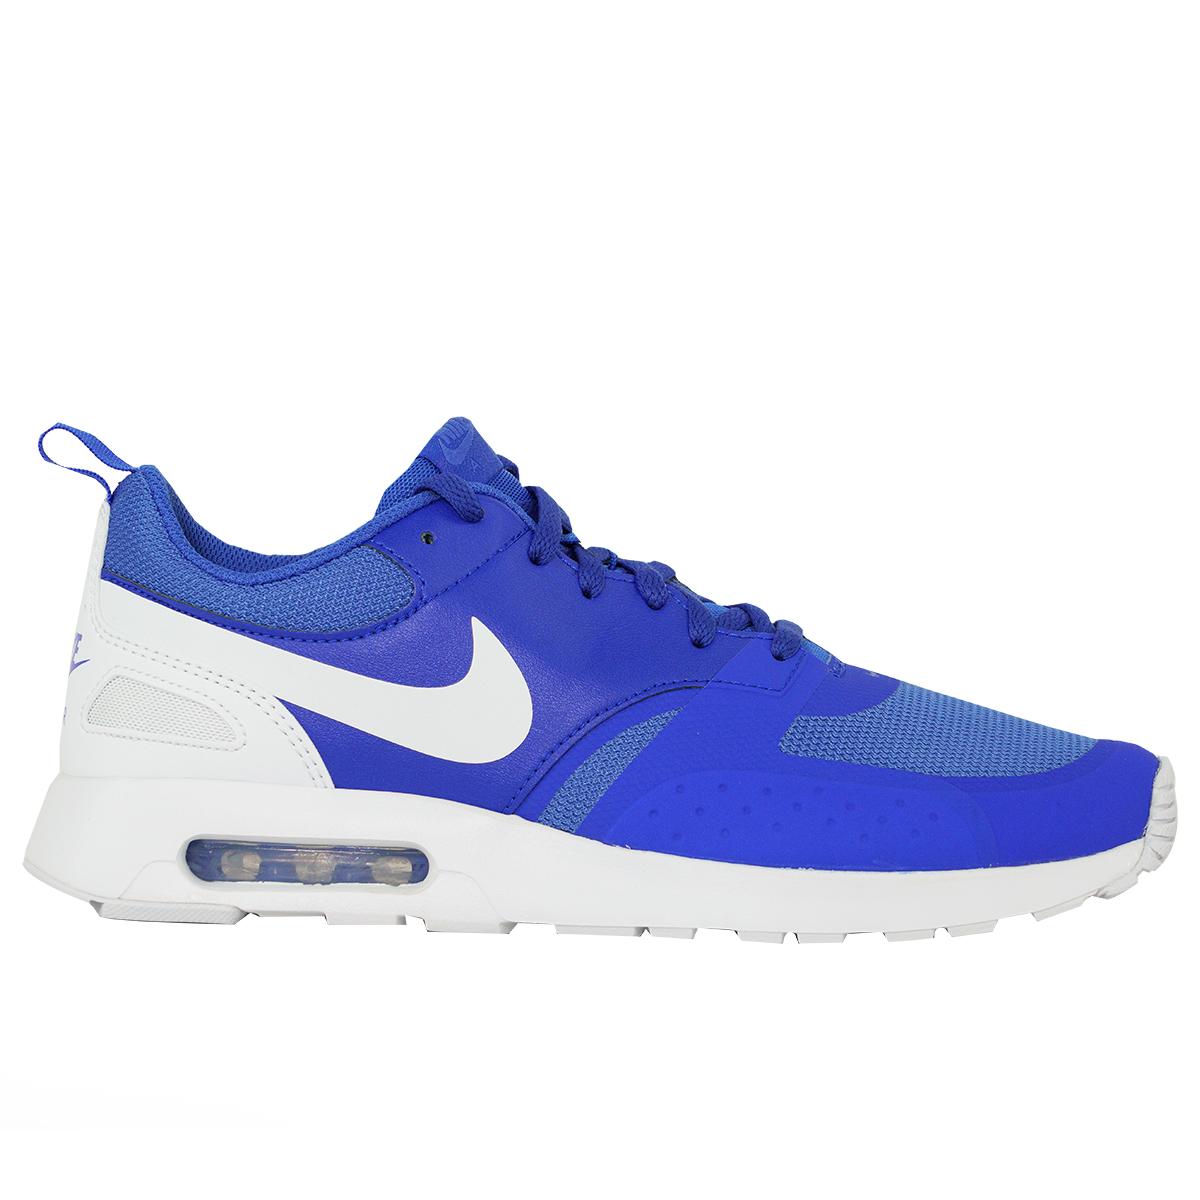 Nike Men's Air Max Vision SE Light Blue Shoes